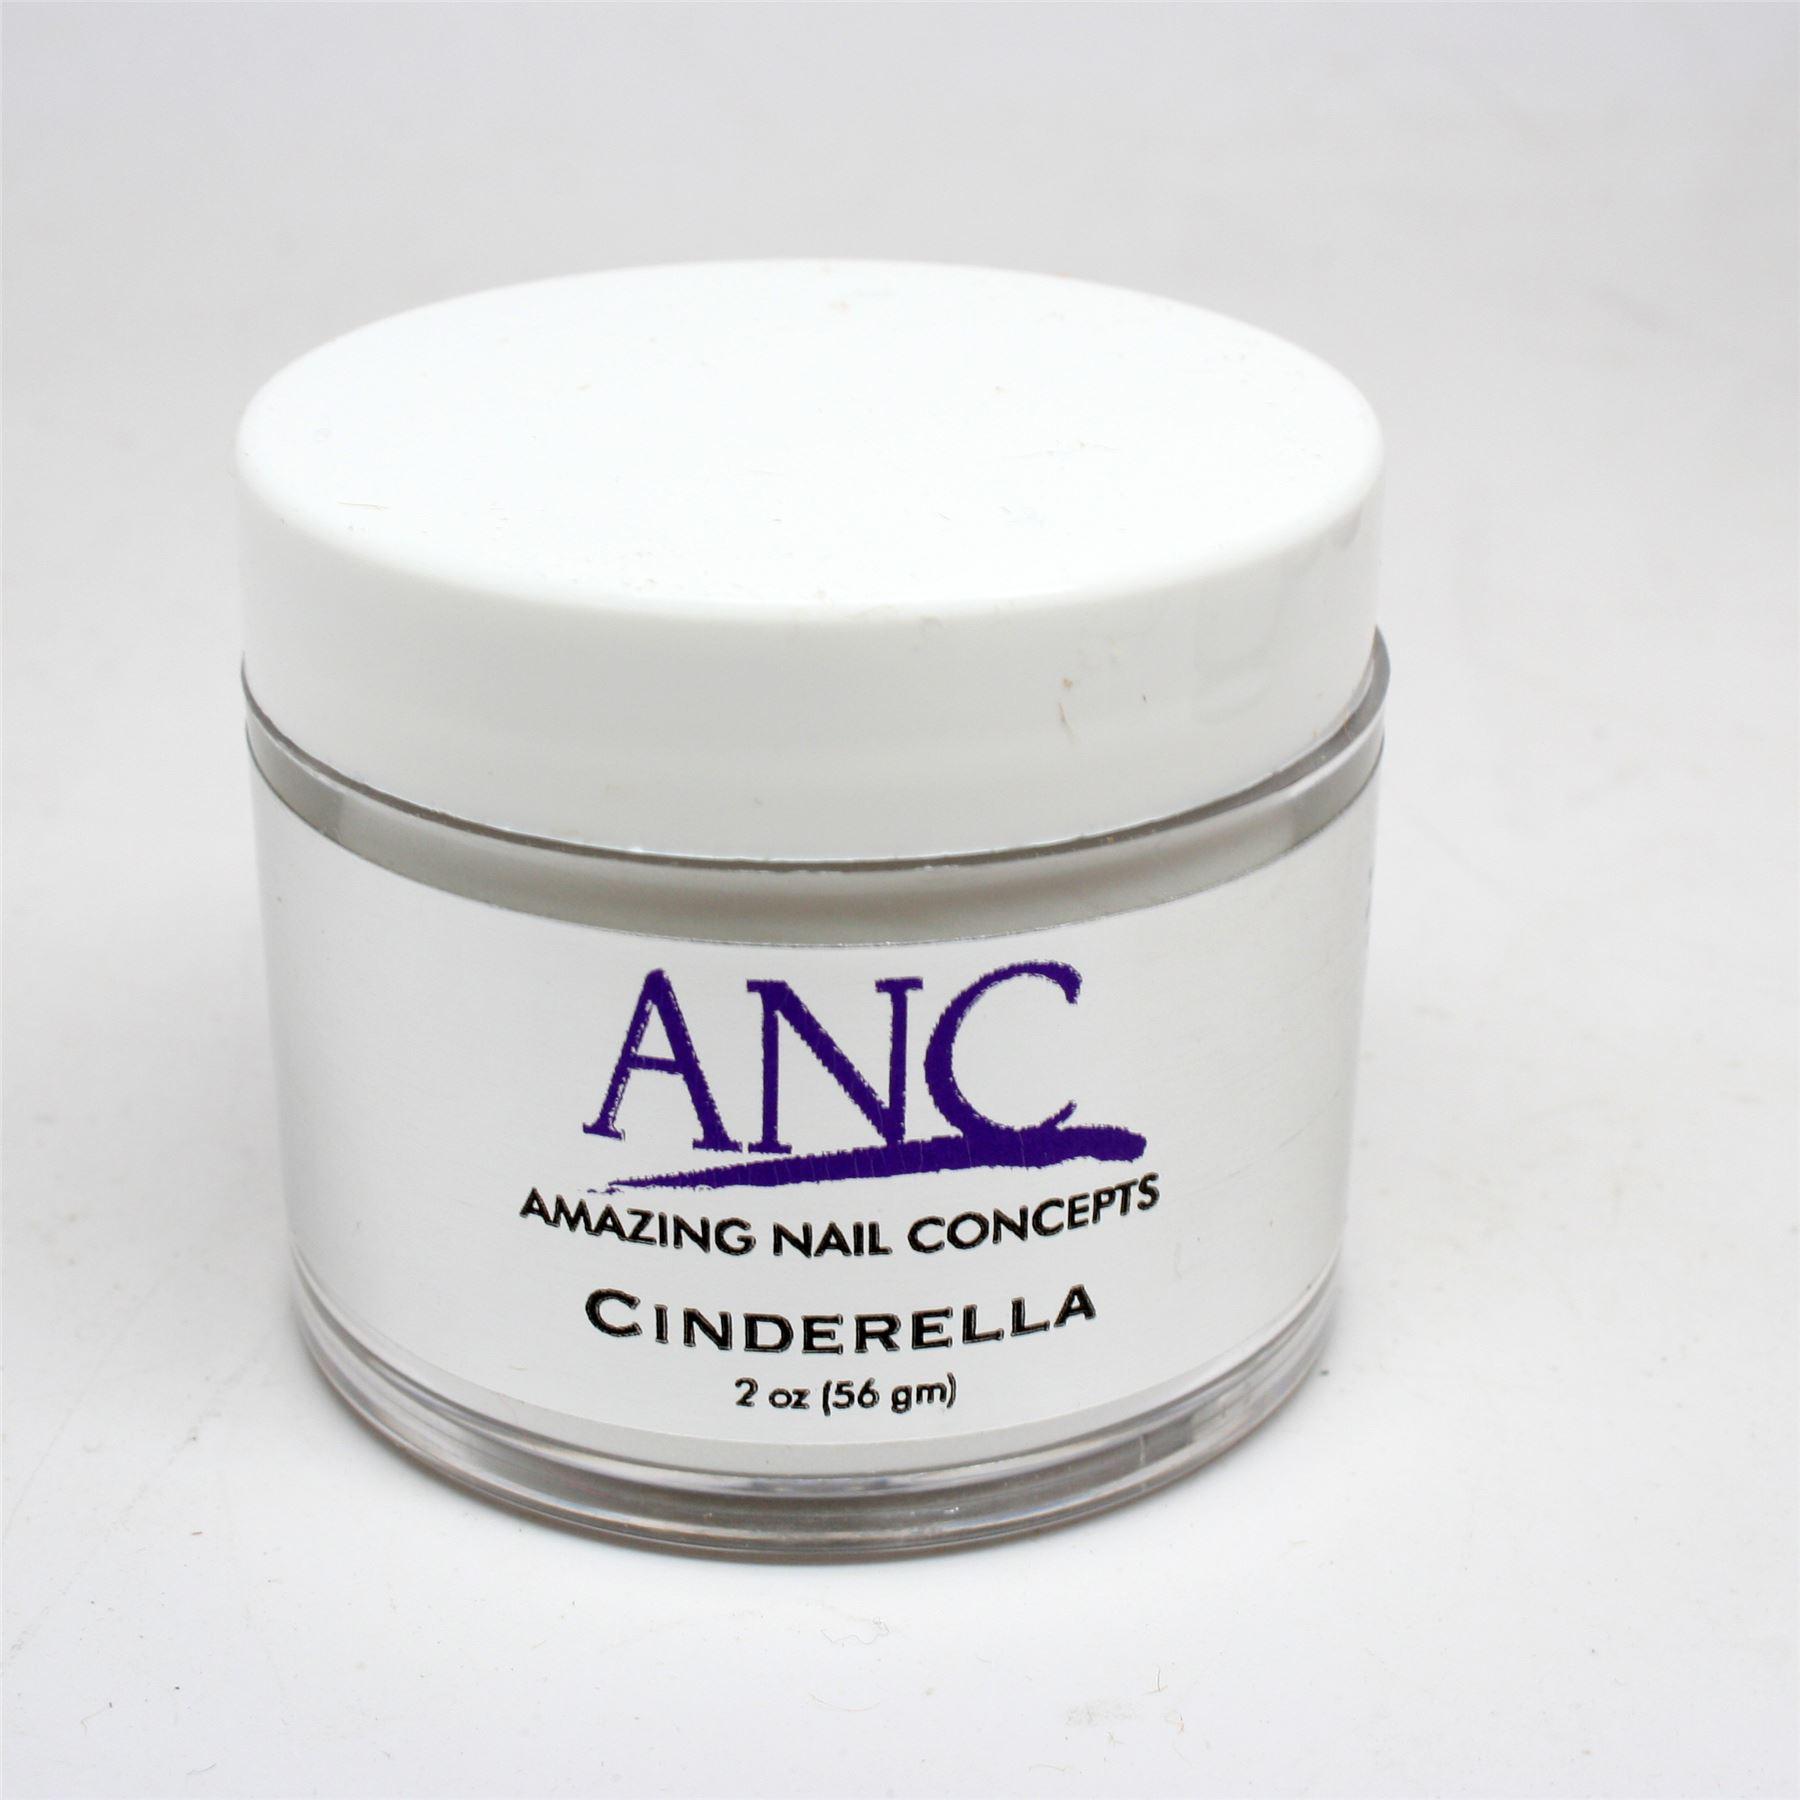 ANC Dip Powder Amazing Nail Concepts 2 Oz Cinderella